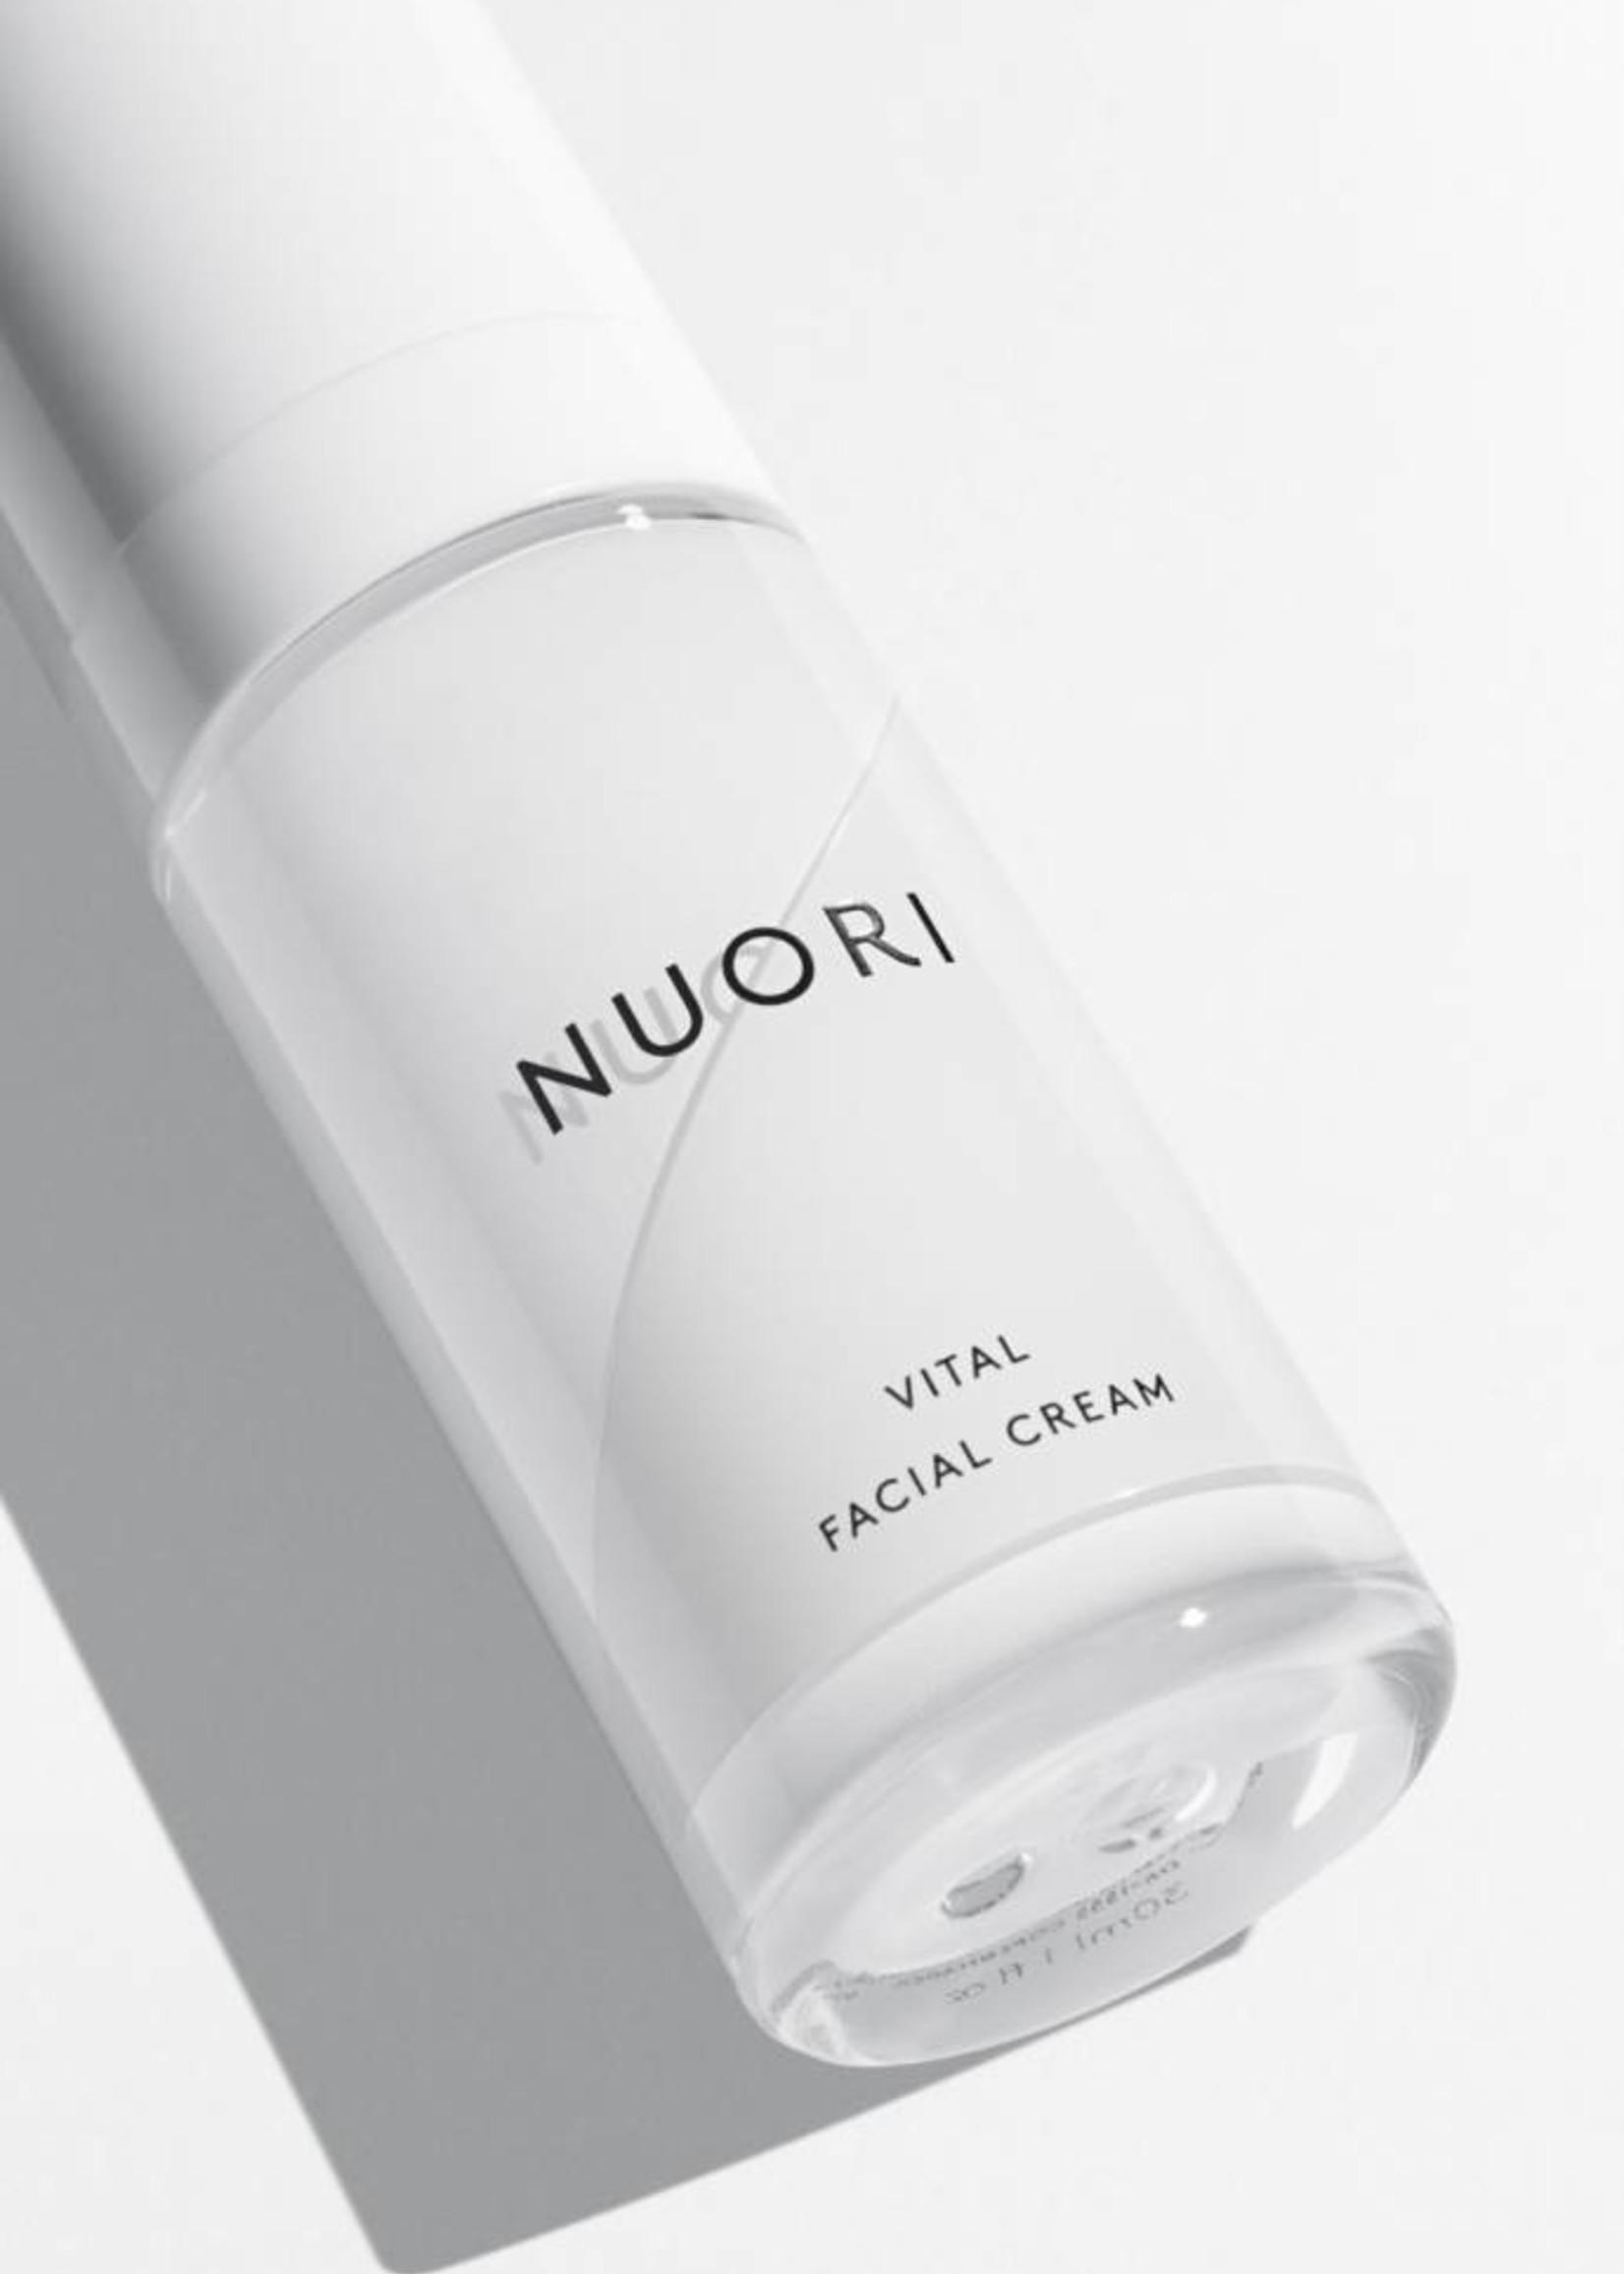 NUORI NUORI Vital Face Cream 30ml